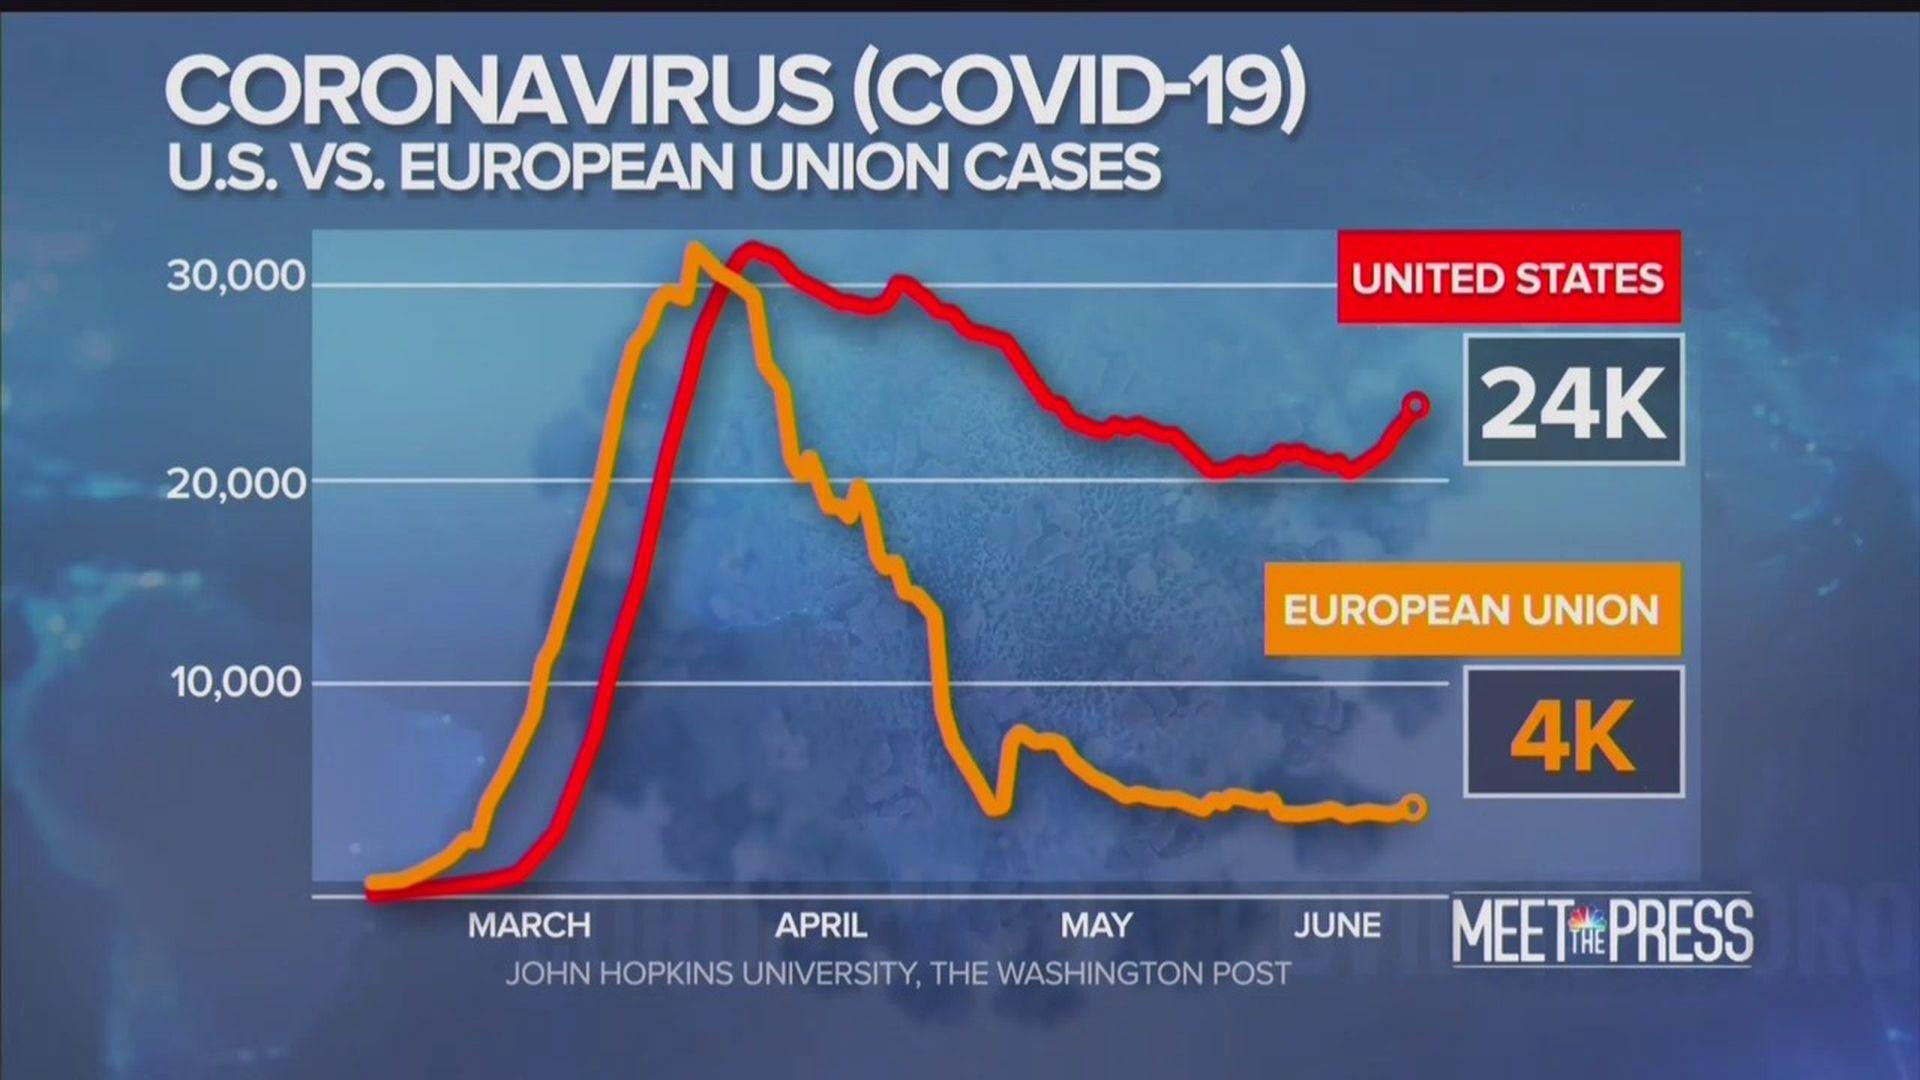 EU vs US coronavirus graph